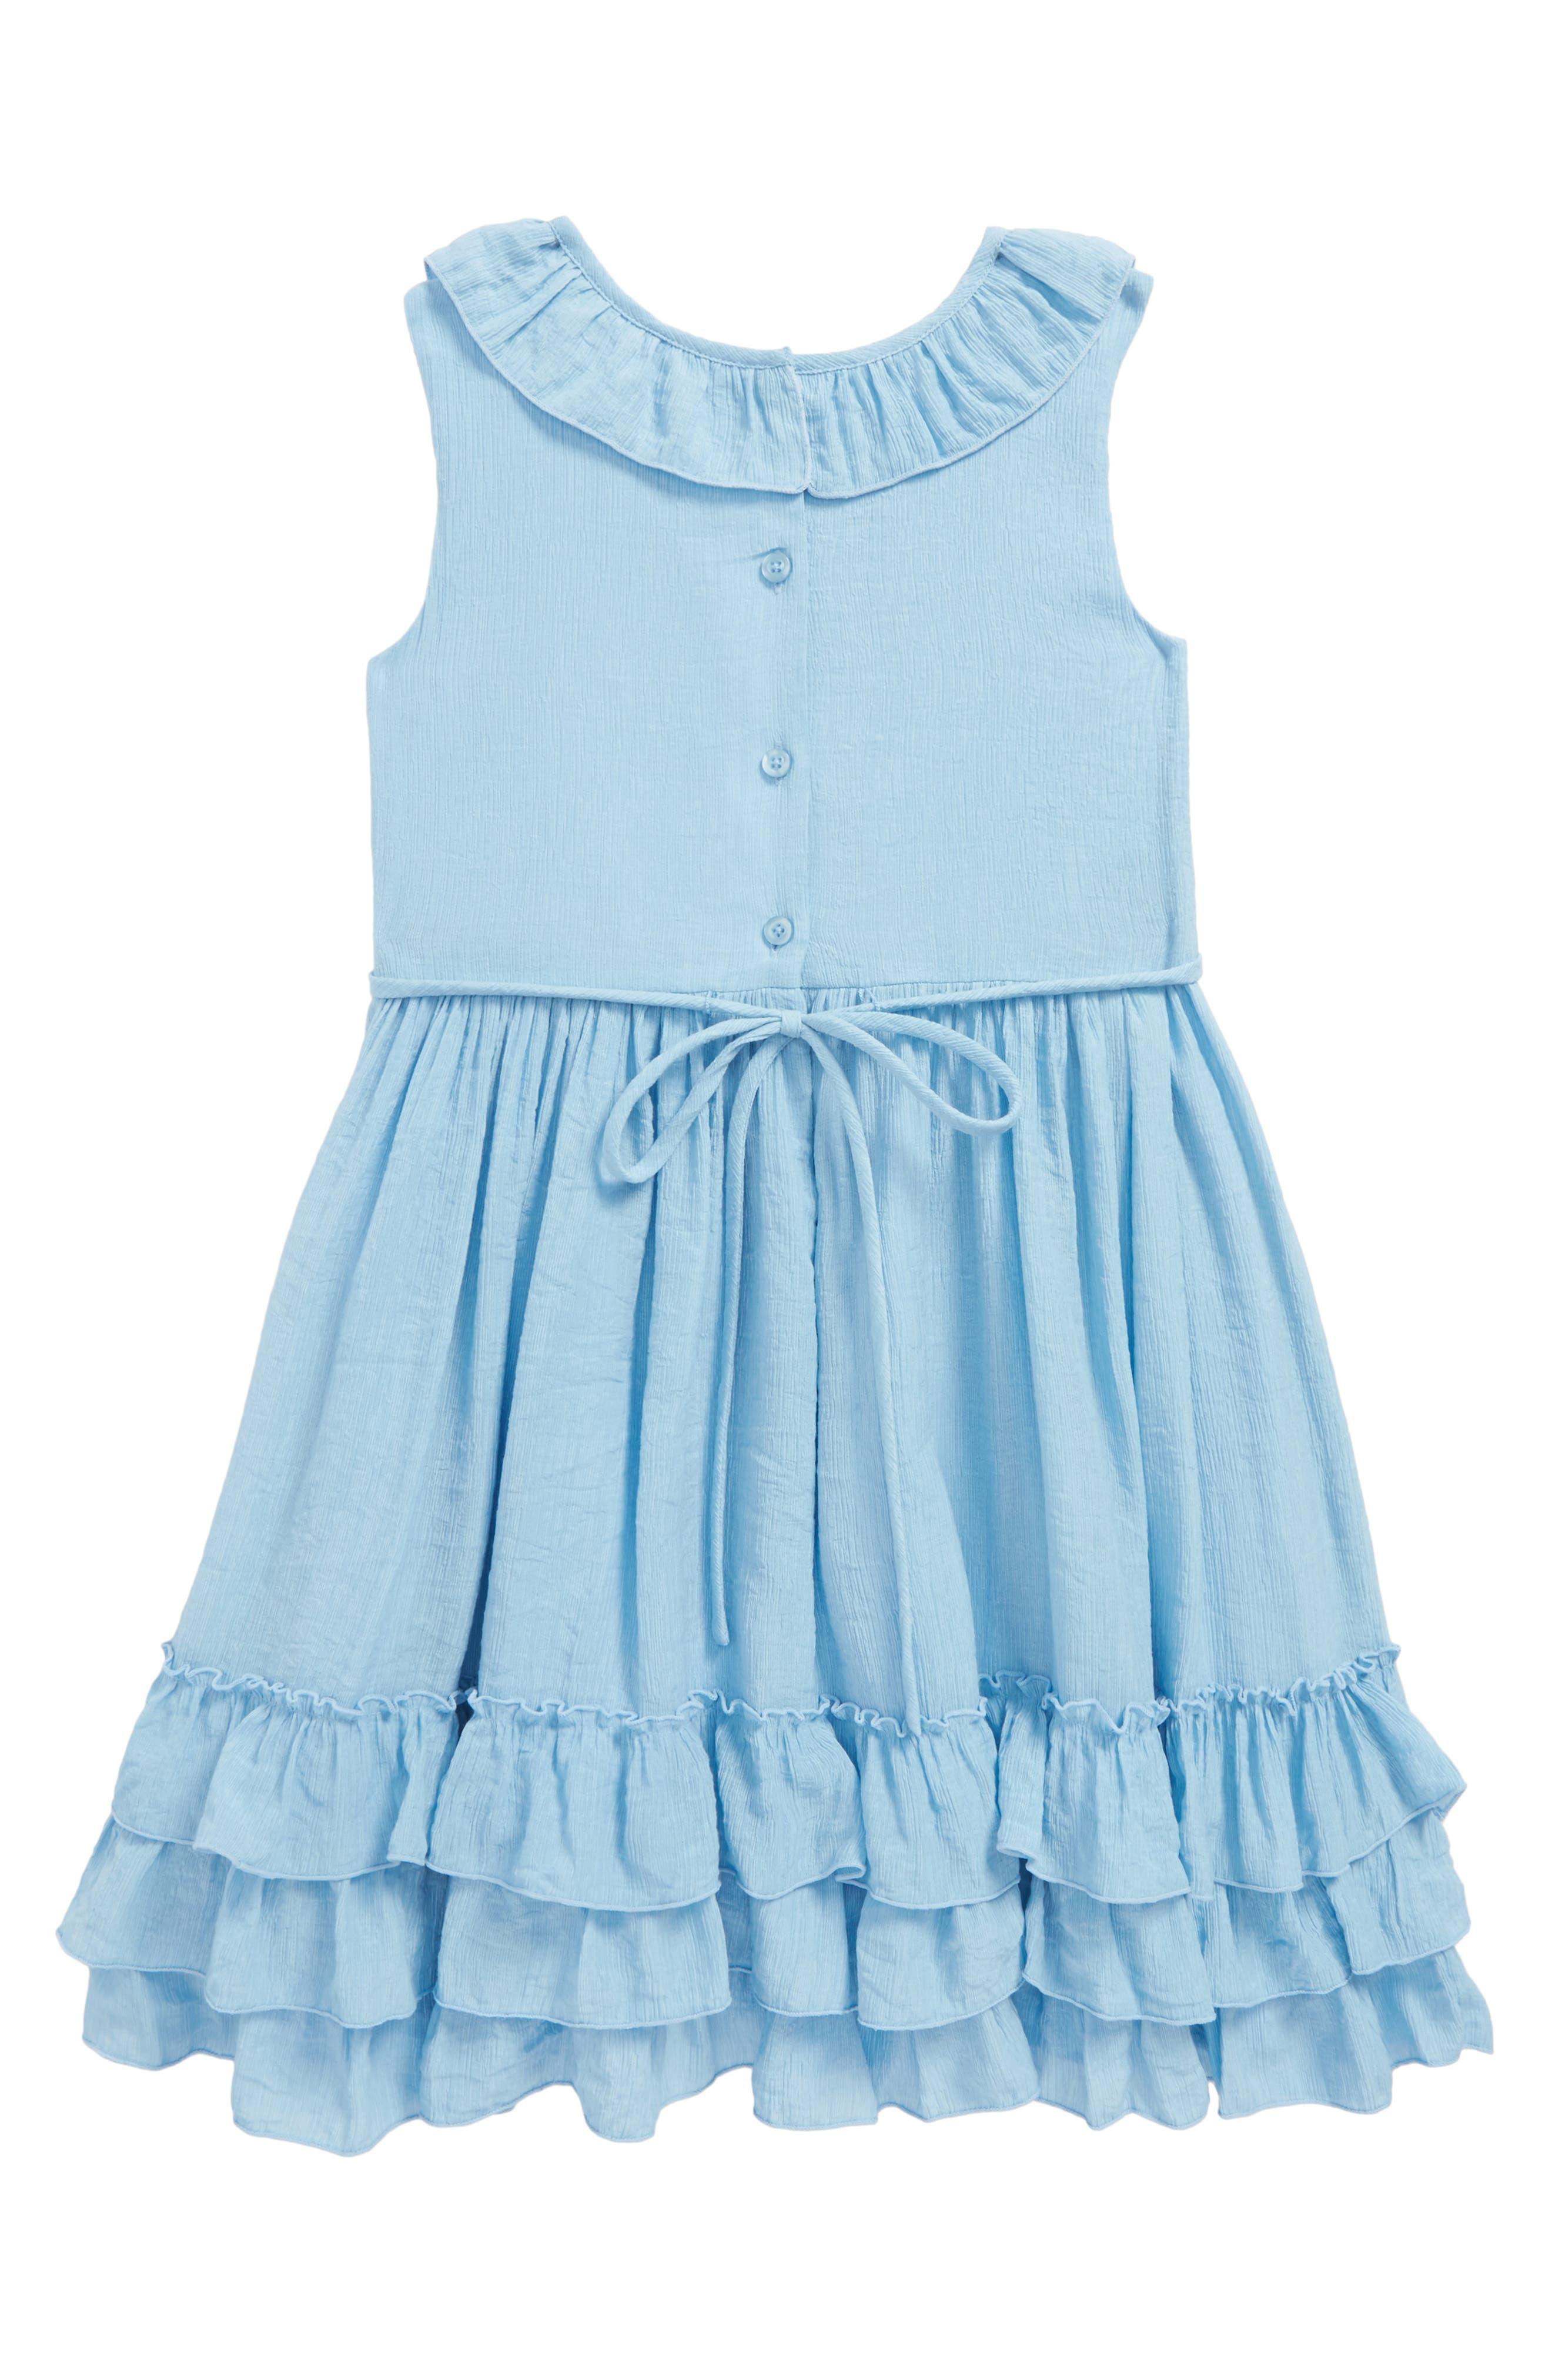 Ruffle Dress,                             Alternate thumbnail 2, color,                             450